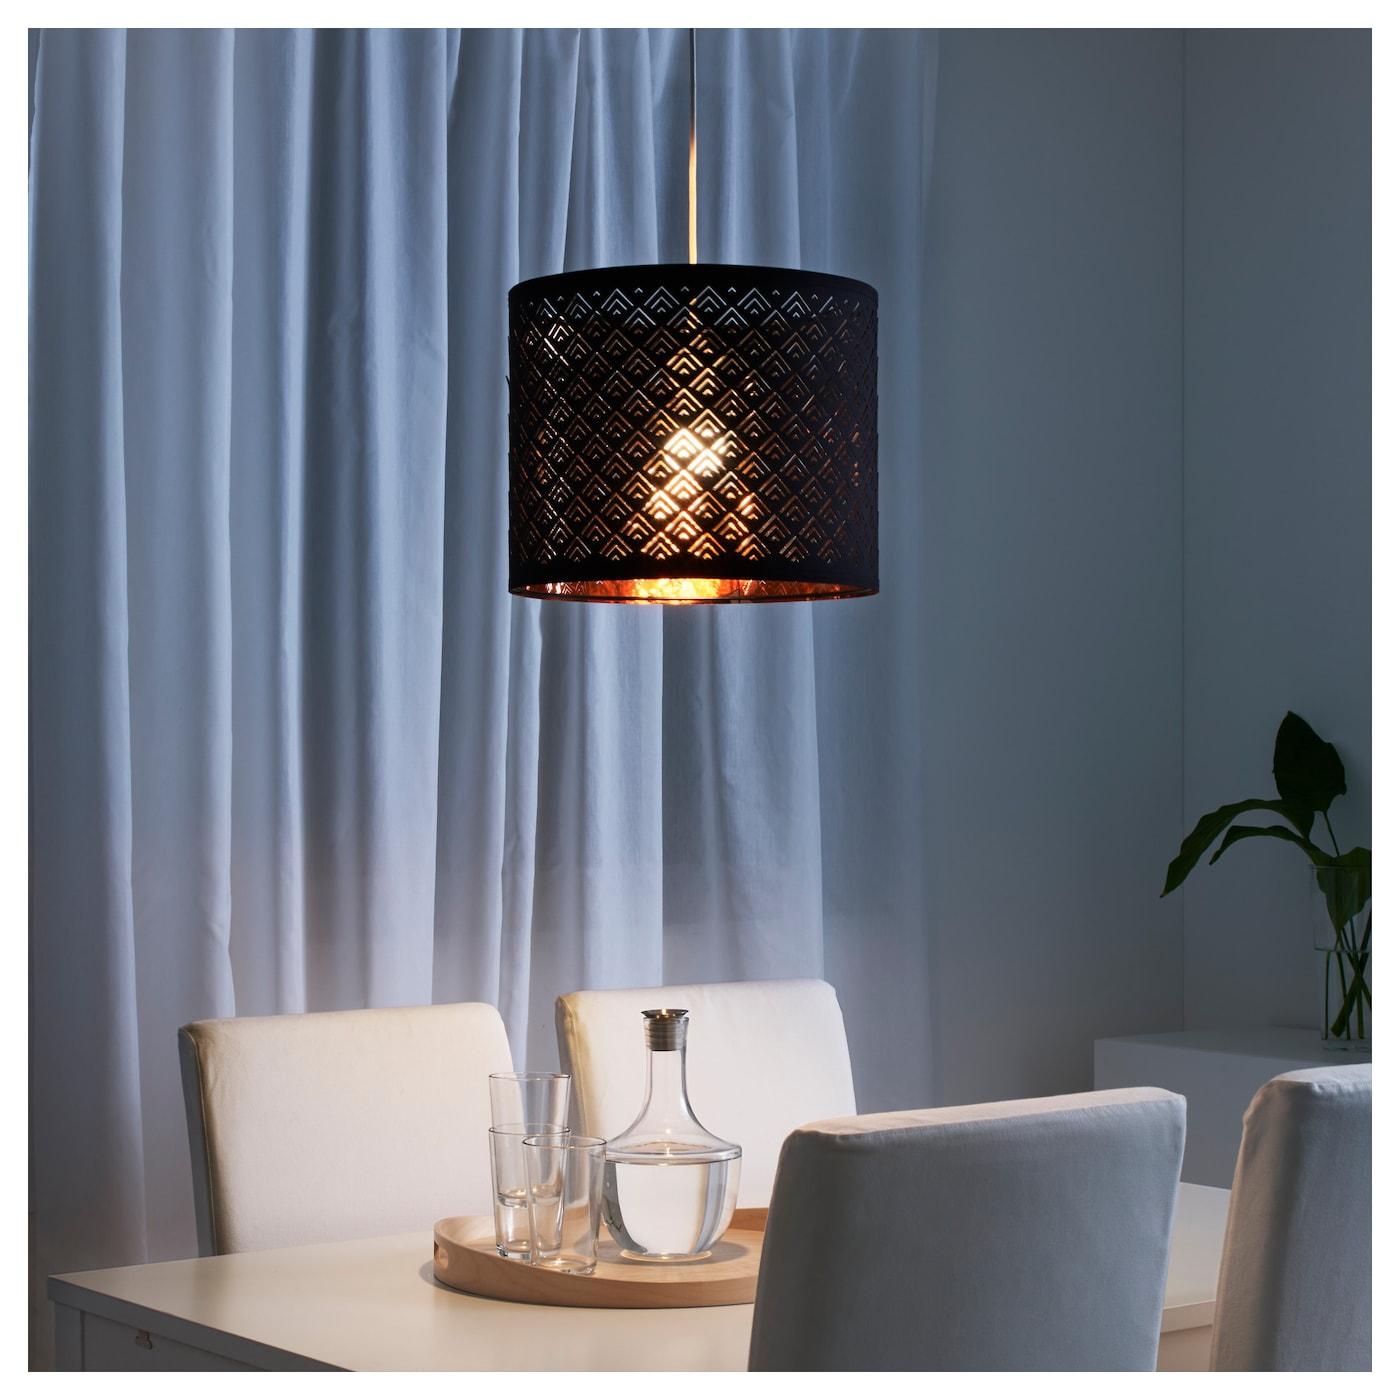 Kupferrohr Lampe. Kupferrohr Kupferrohr Lampen Werbeaktion Fr ...